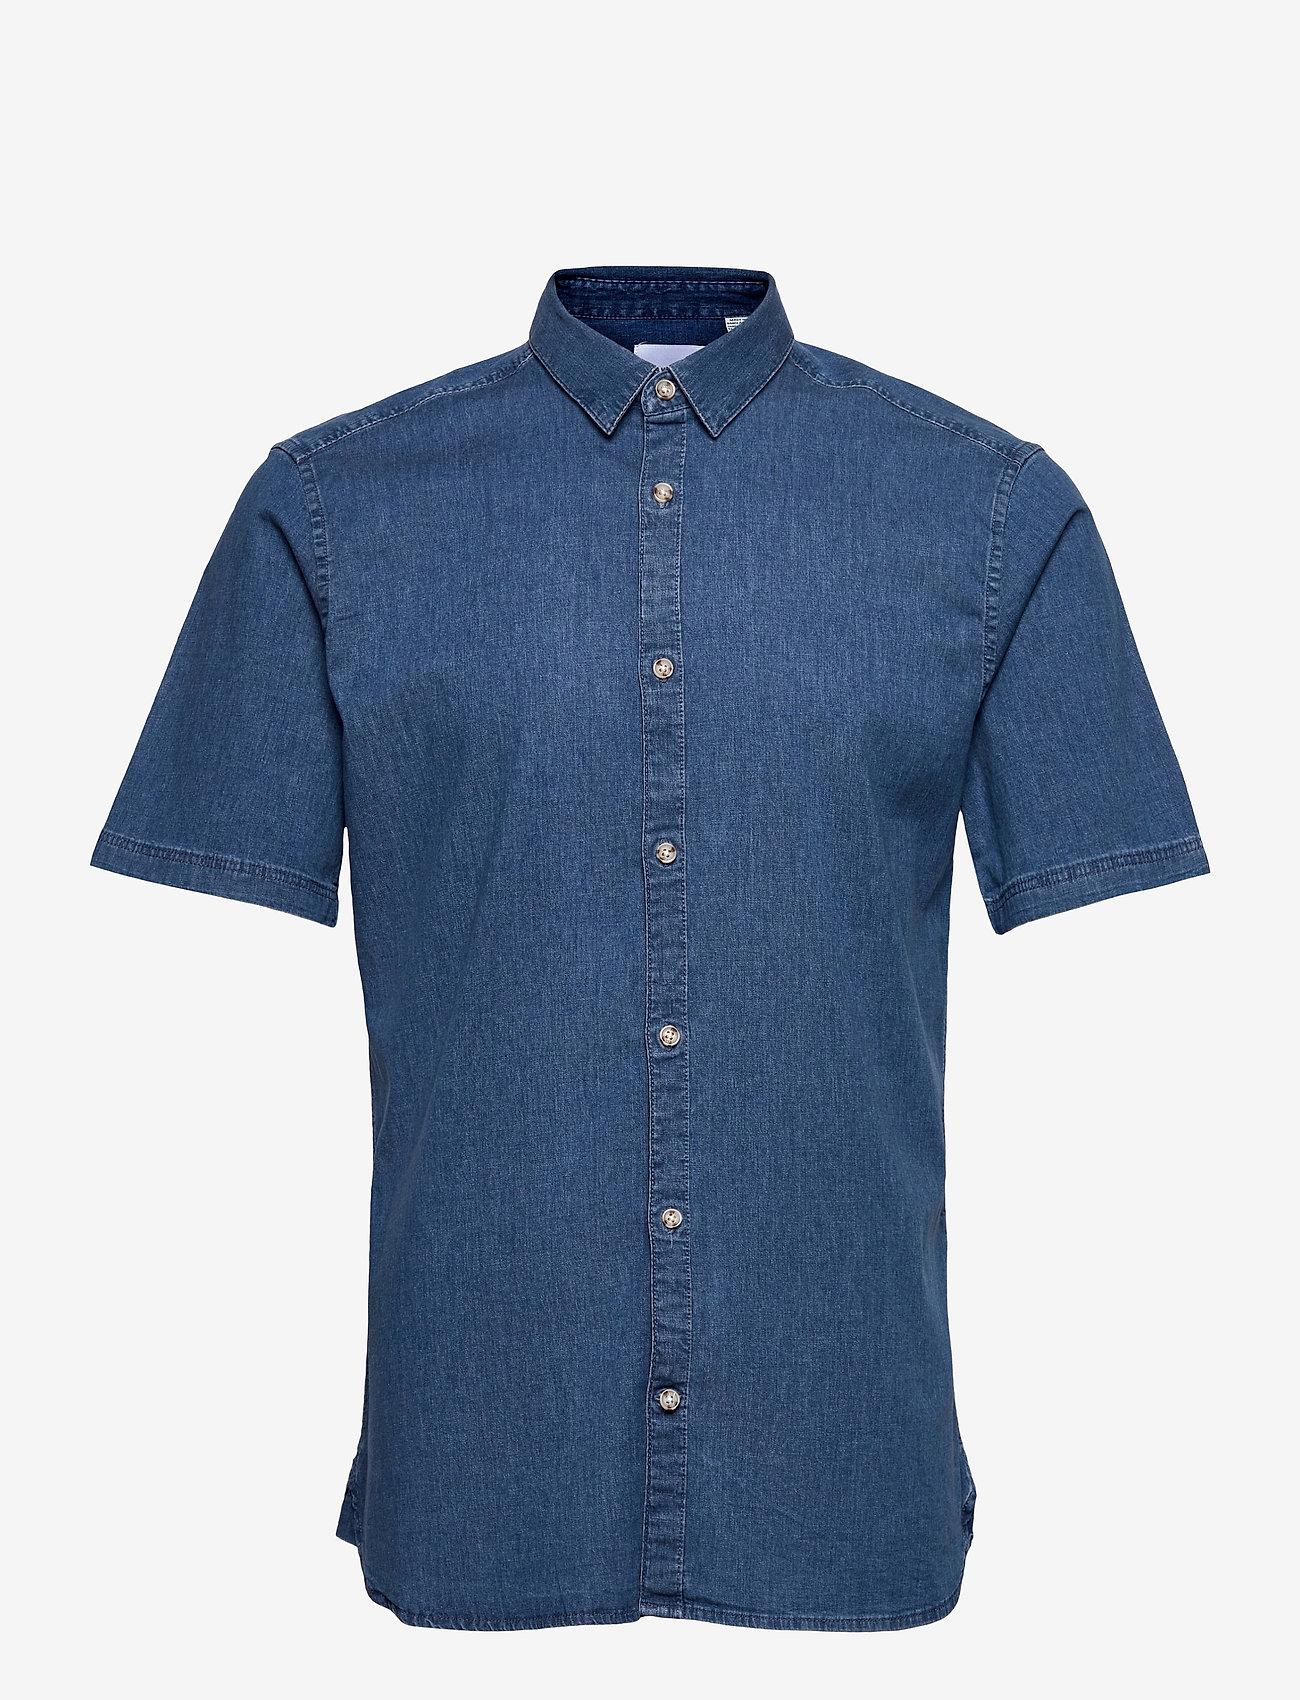 ONLY & SONS - ONSTROY LIFE SS CHAMBRAY STRETCH SHIRT - koszule w kratkę - medium blue denim - 0